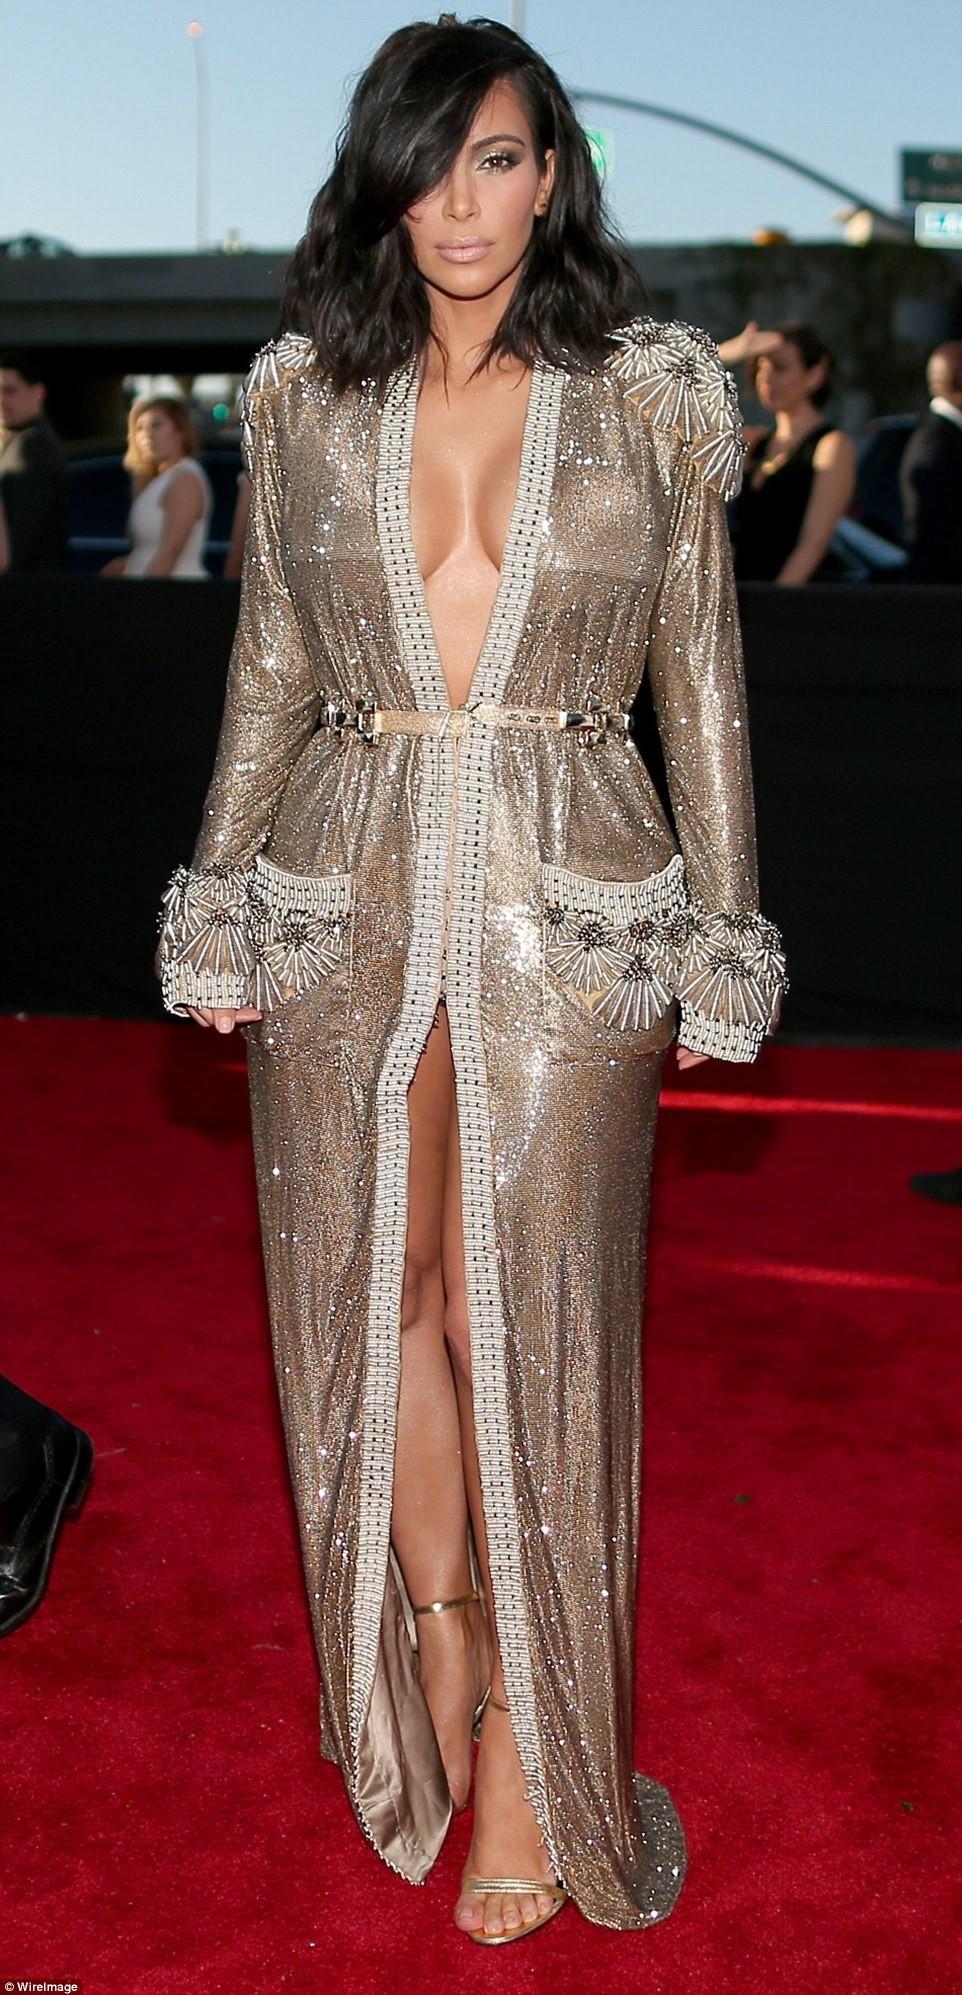 Kim Kardashian Celebrity Dresses